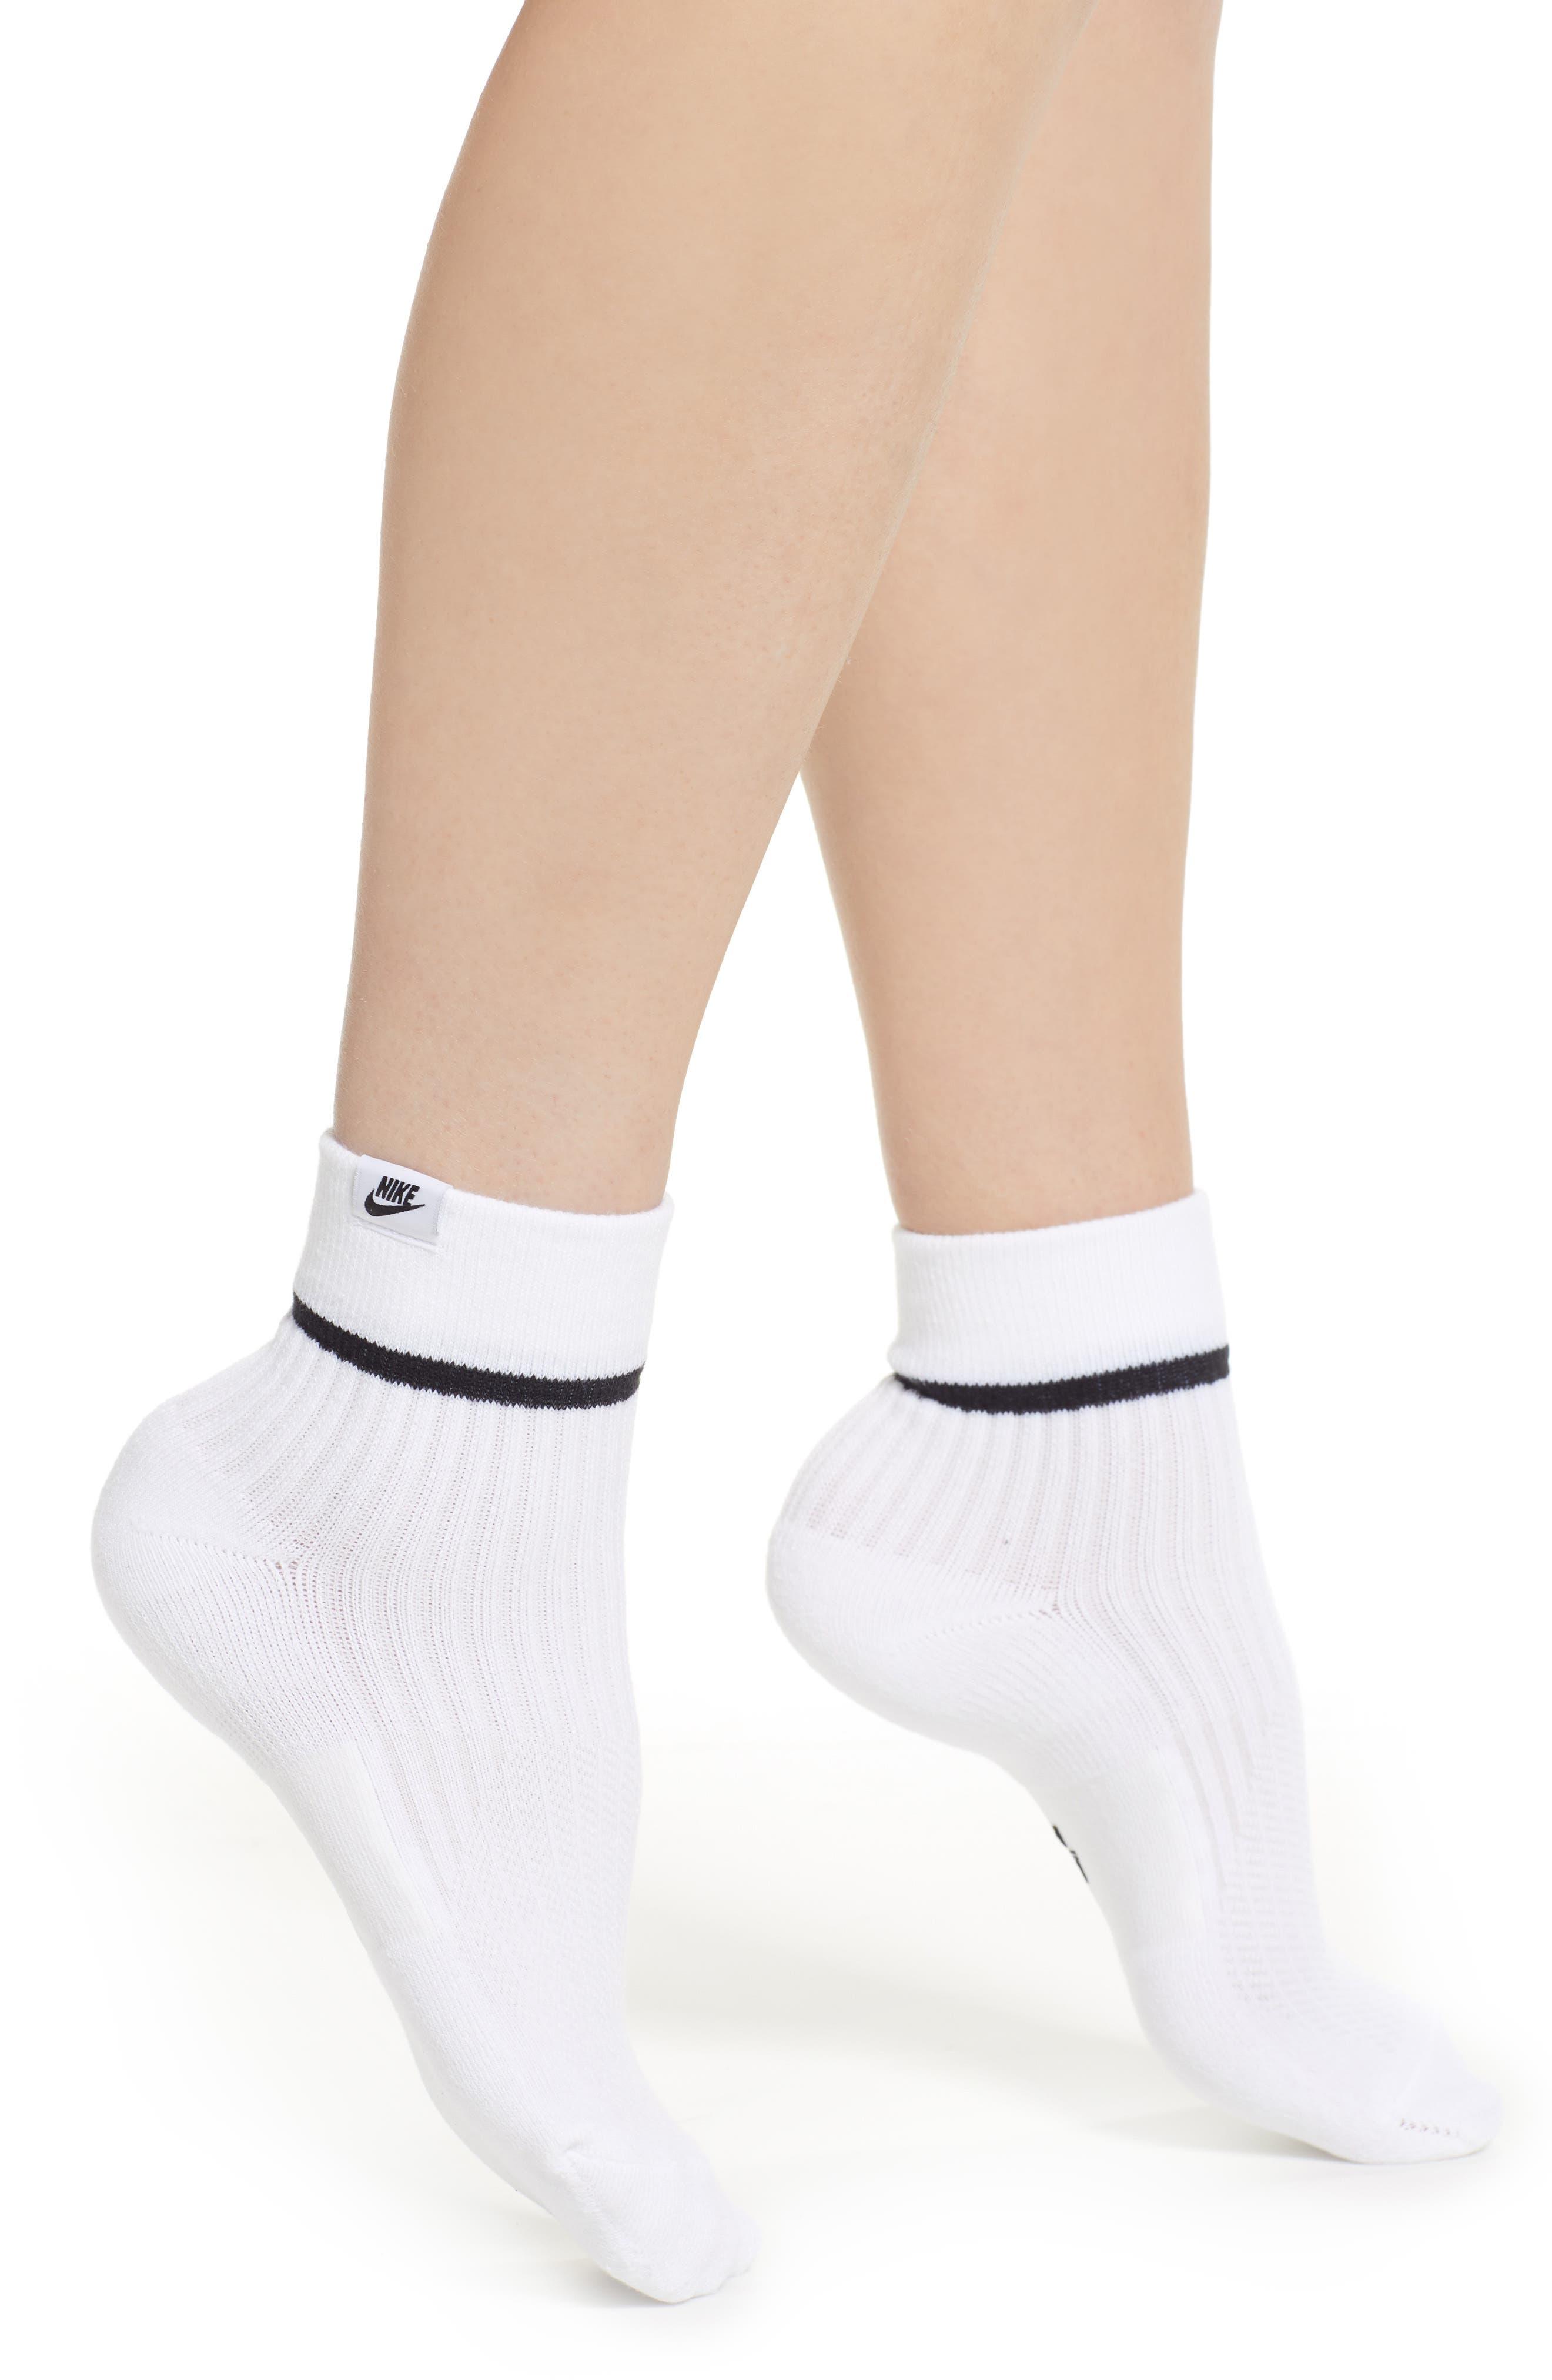 2-Pack Snkr Sox Essential Ankle Socks in White/ Black/ Black